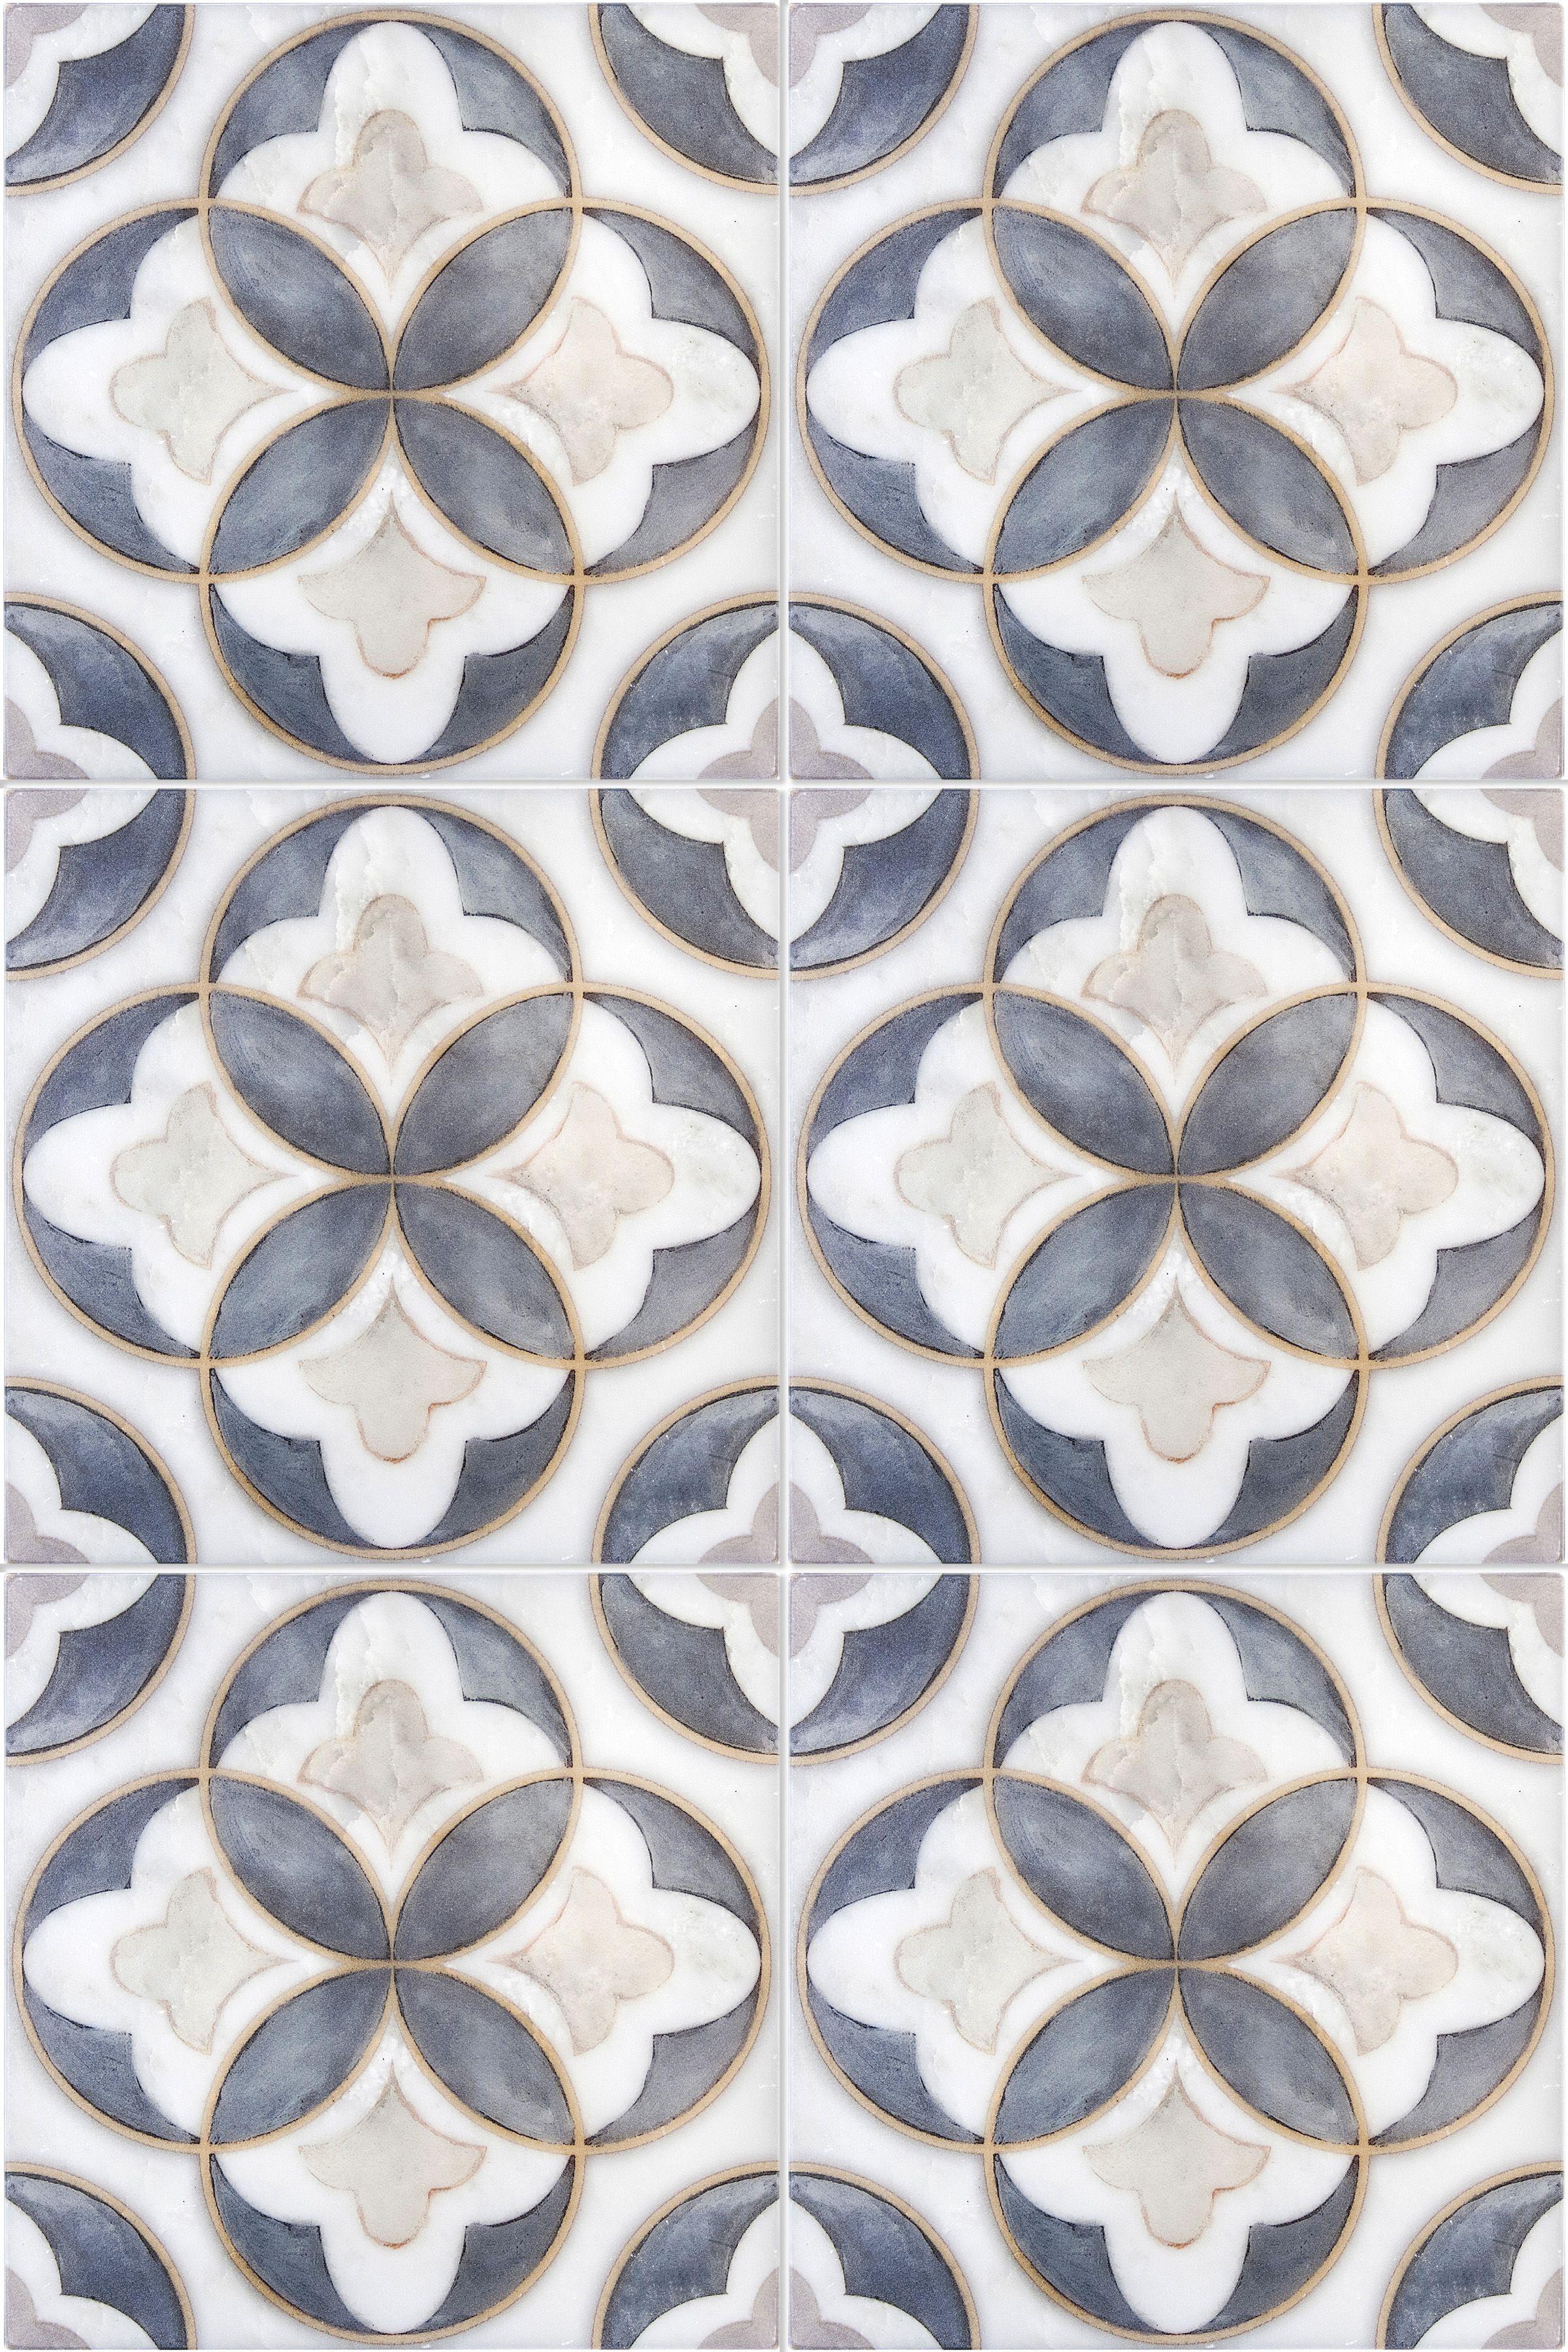 Mulholland Tile Pattern Tiles From Artisan Stone Tile By Stoneimpressions Artisan Stone Tile Tile Patterns Tiles